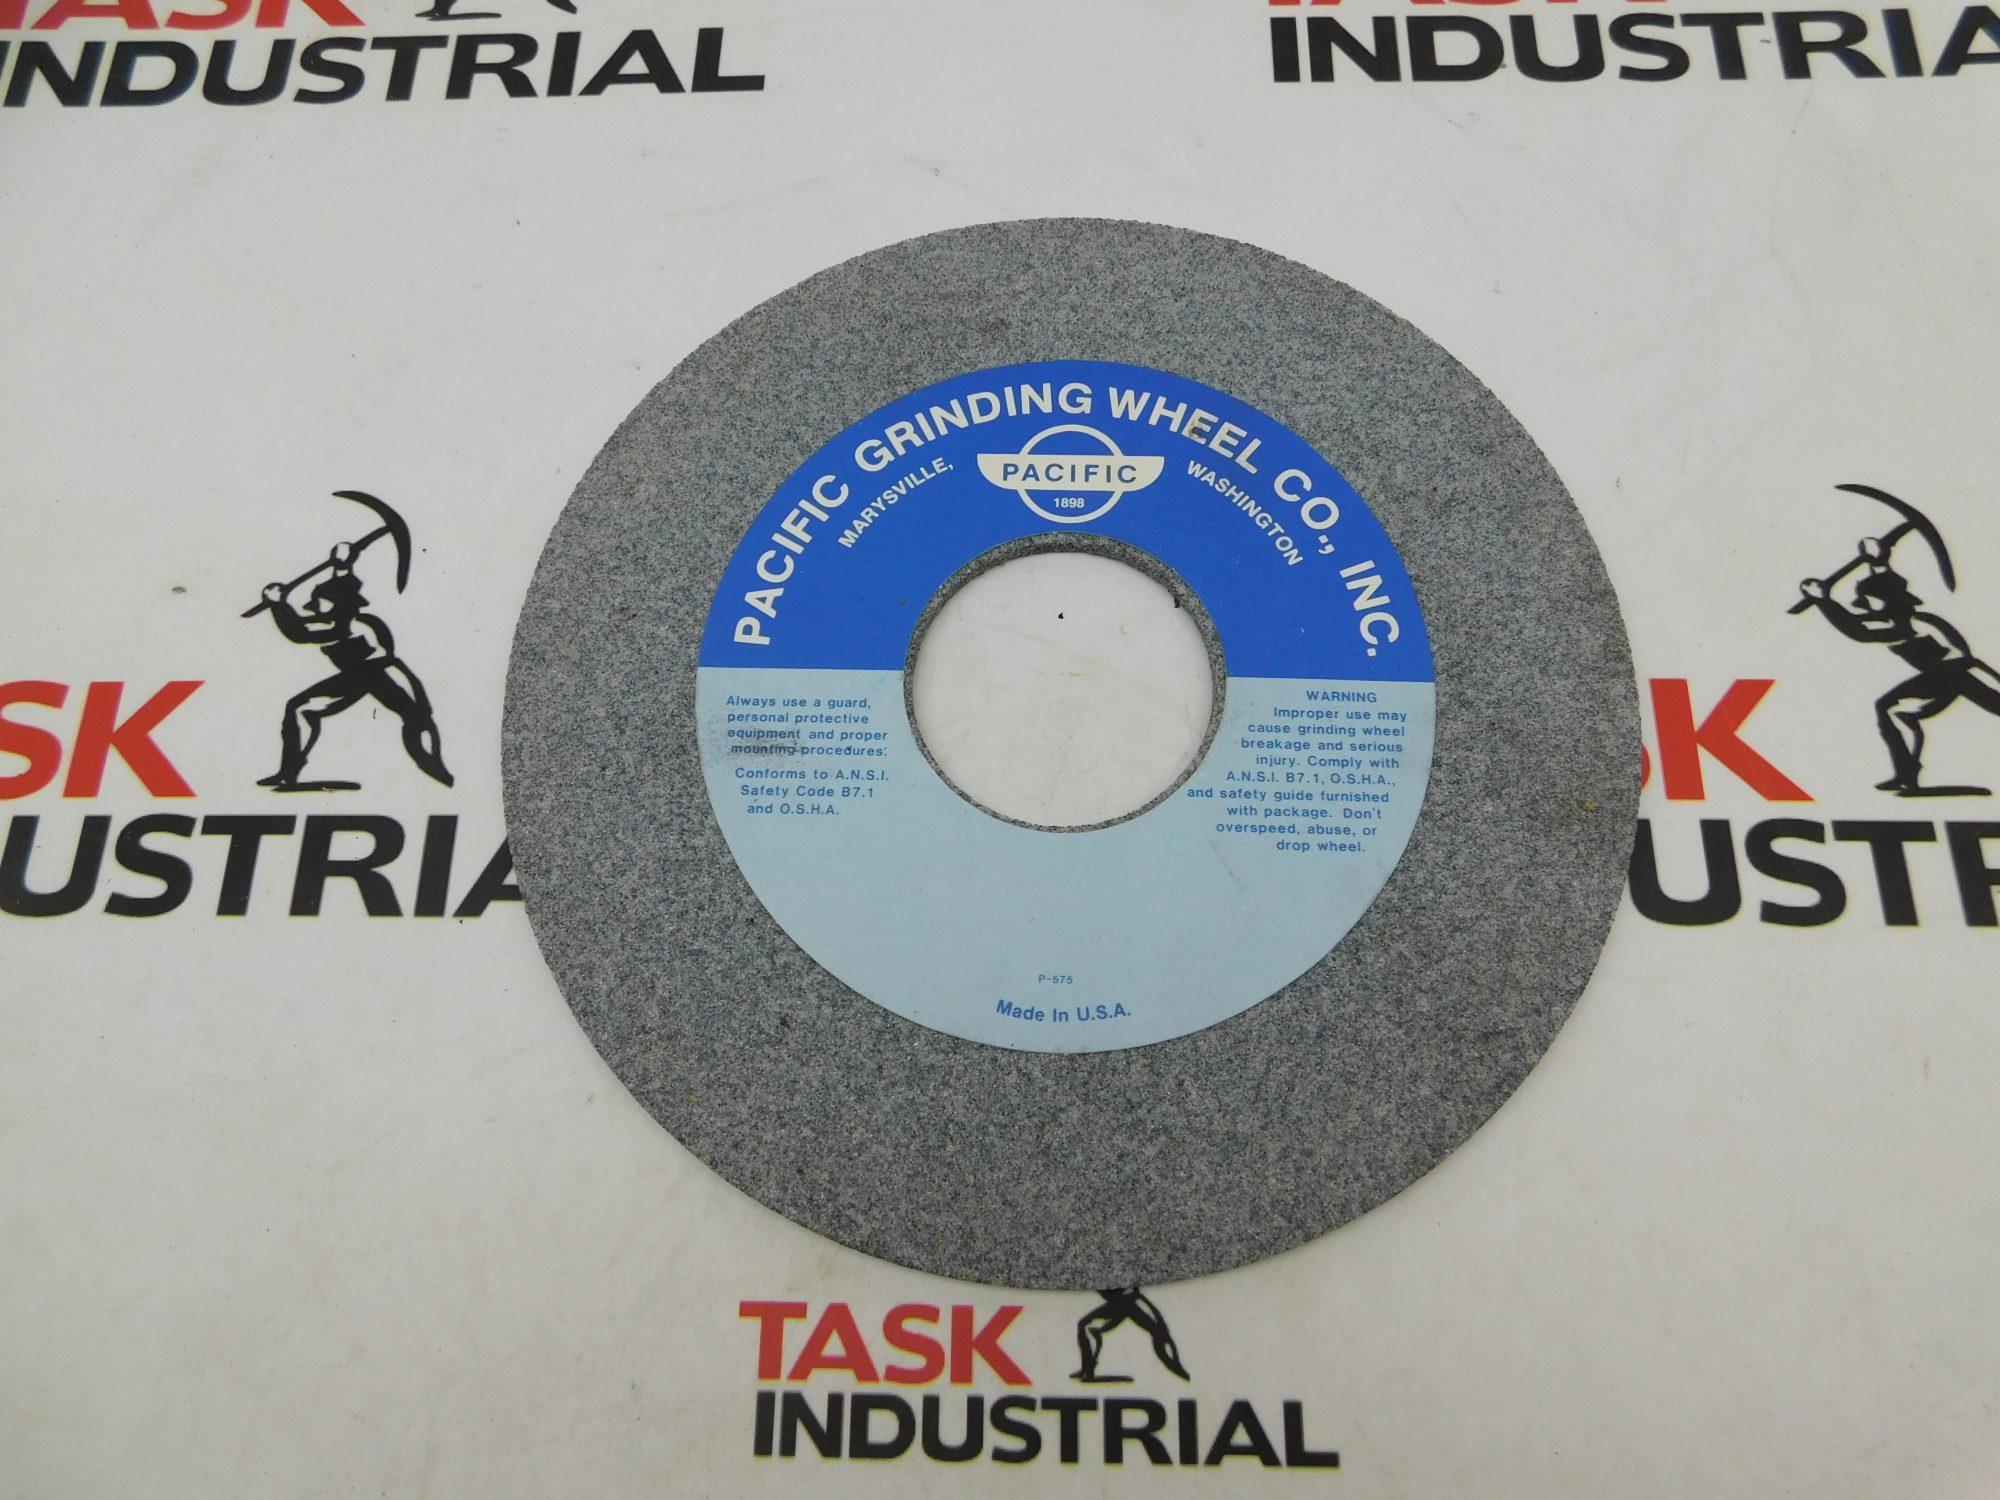 Pacific Grinding Wheel 43A46/60-K8-VL2 VIT Max 2760 RPM, 225MM X 5MM X 60MM